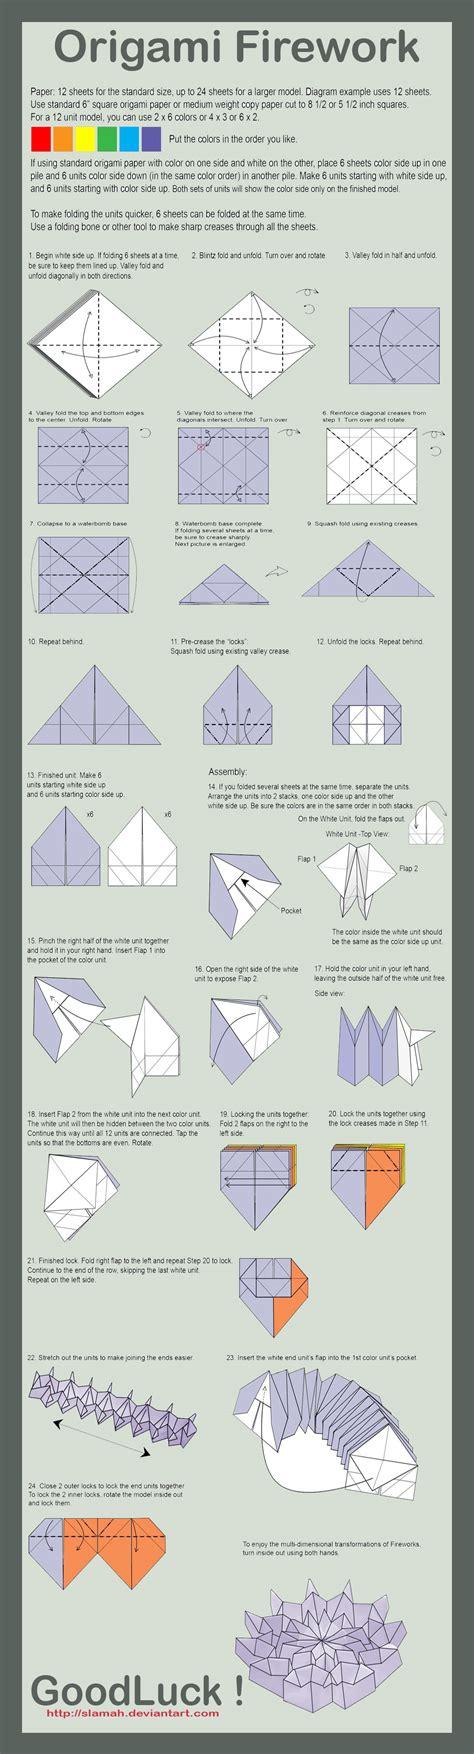 Origami Firework Folding Instructions